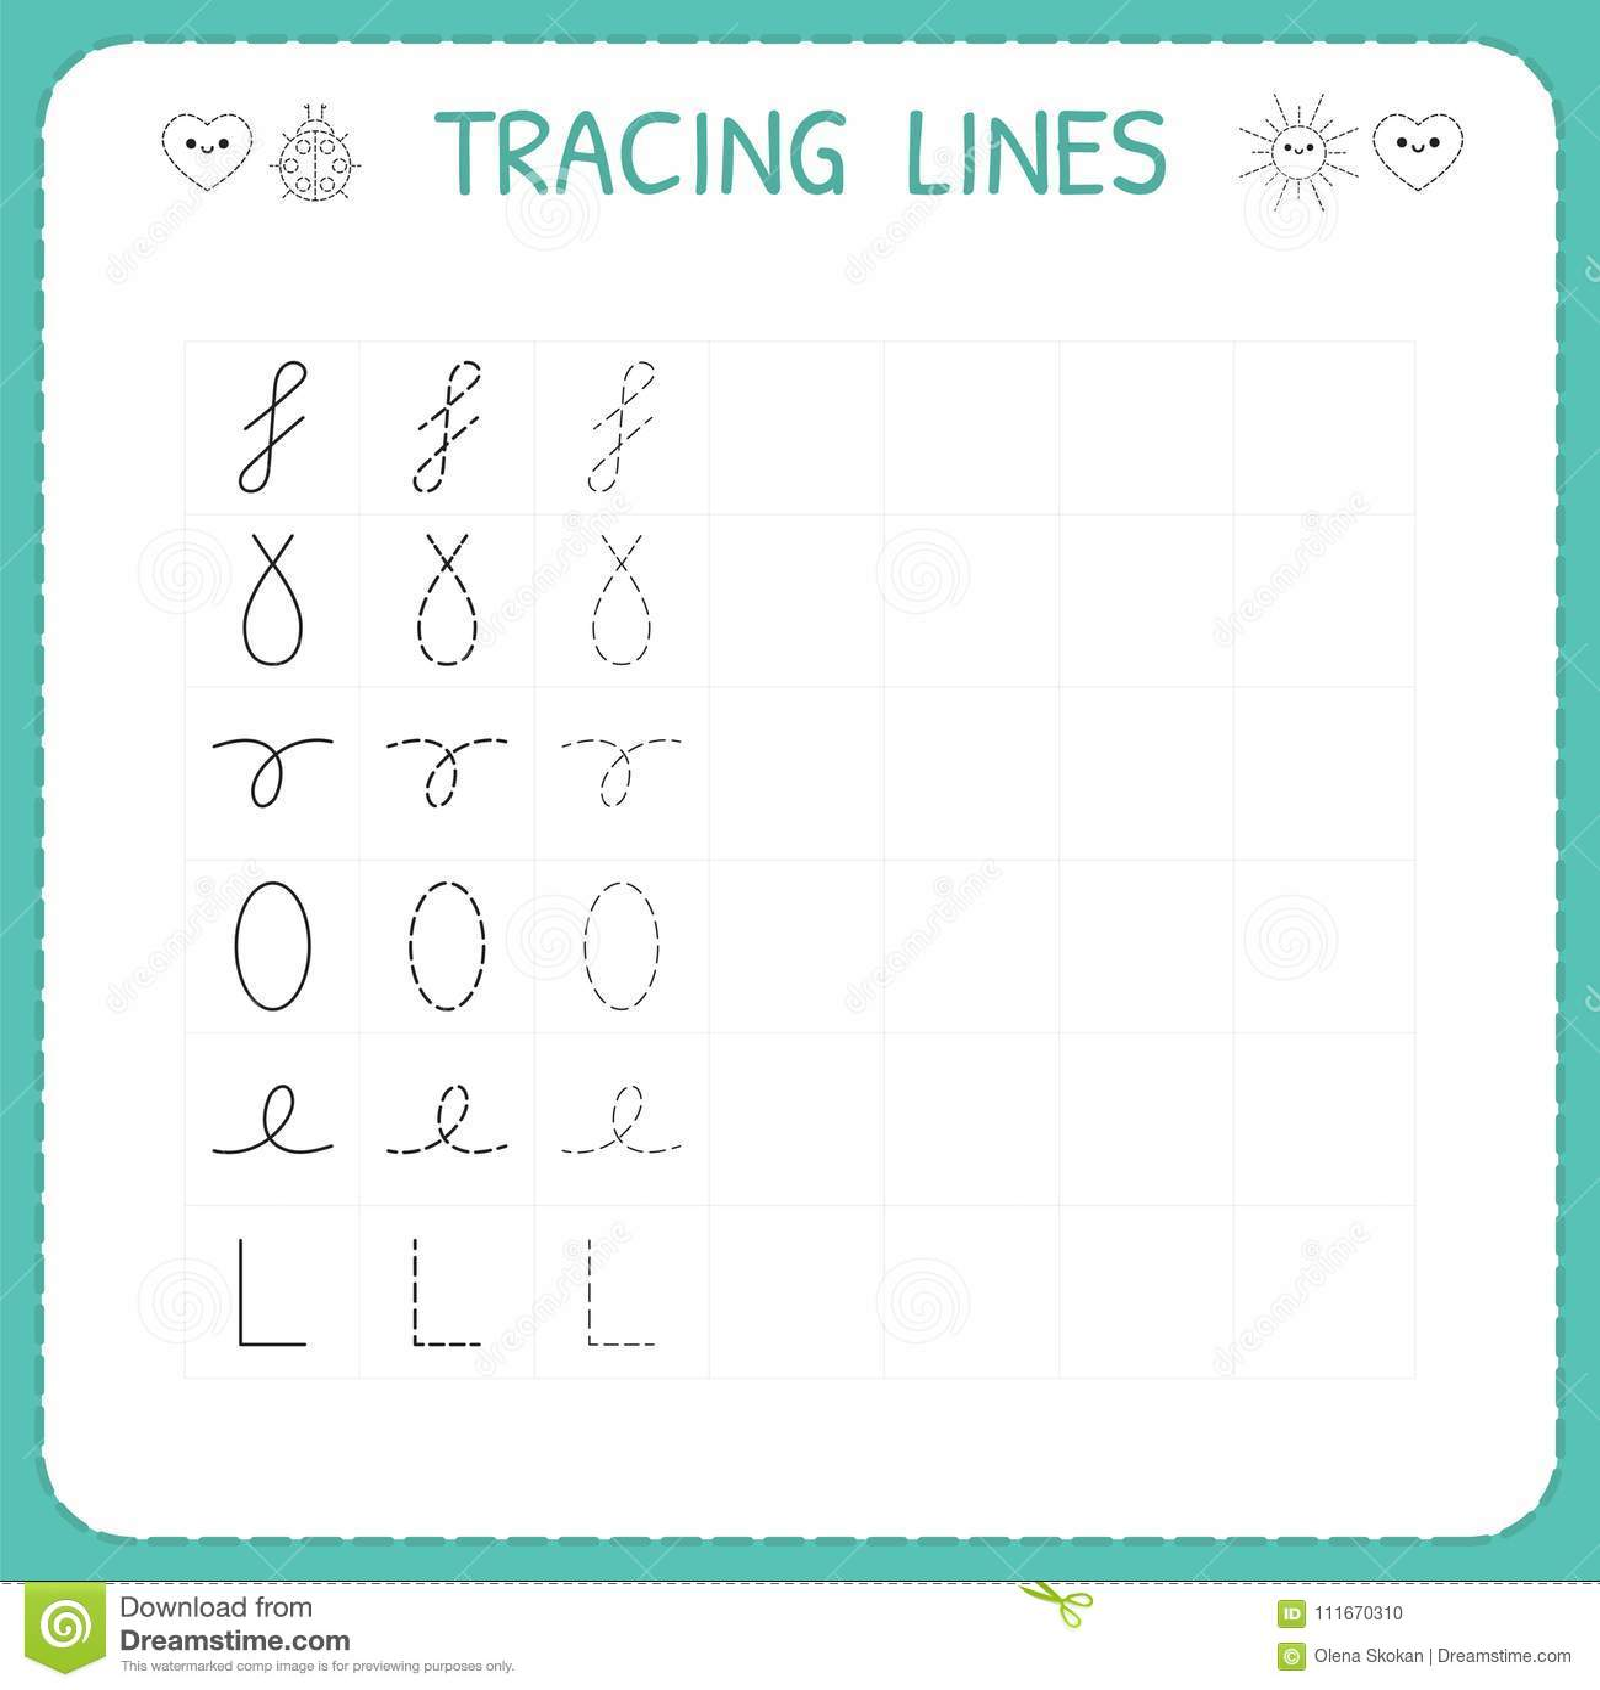 Trace Line Worksheet For Kids Preschool Or Kindergarten